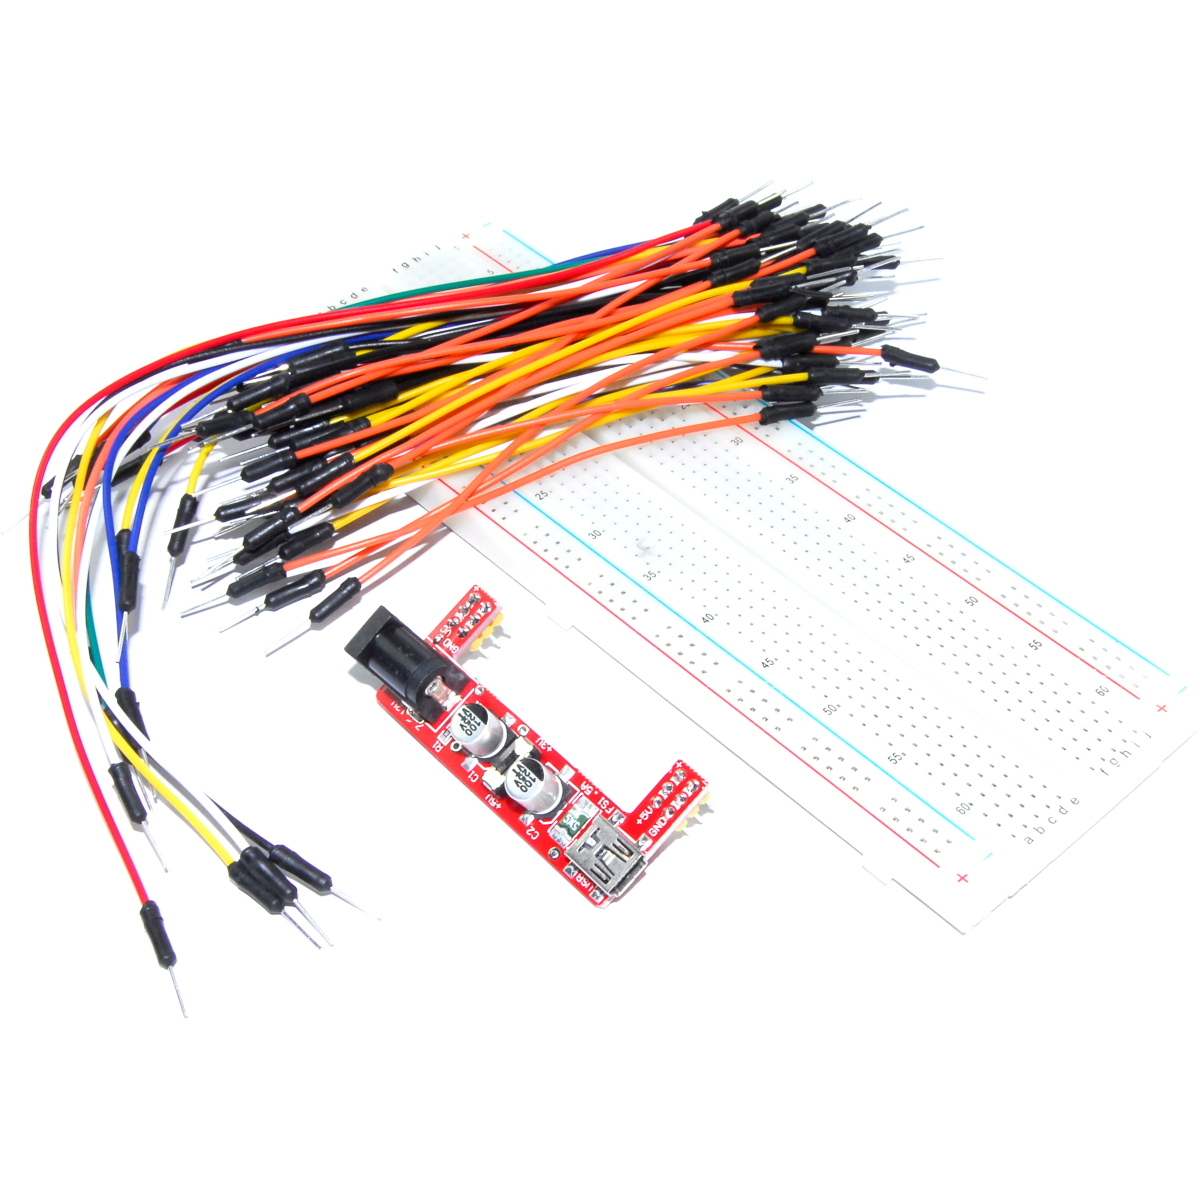 Keyes Breadboard Power Supply MB-102 5V 3.3V USB Arduino MD-112 Flux Workshop